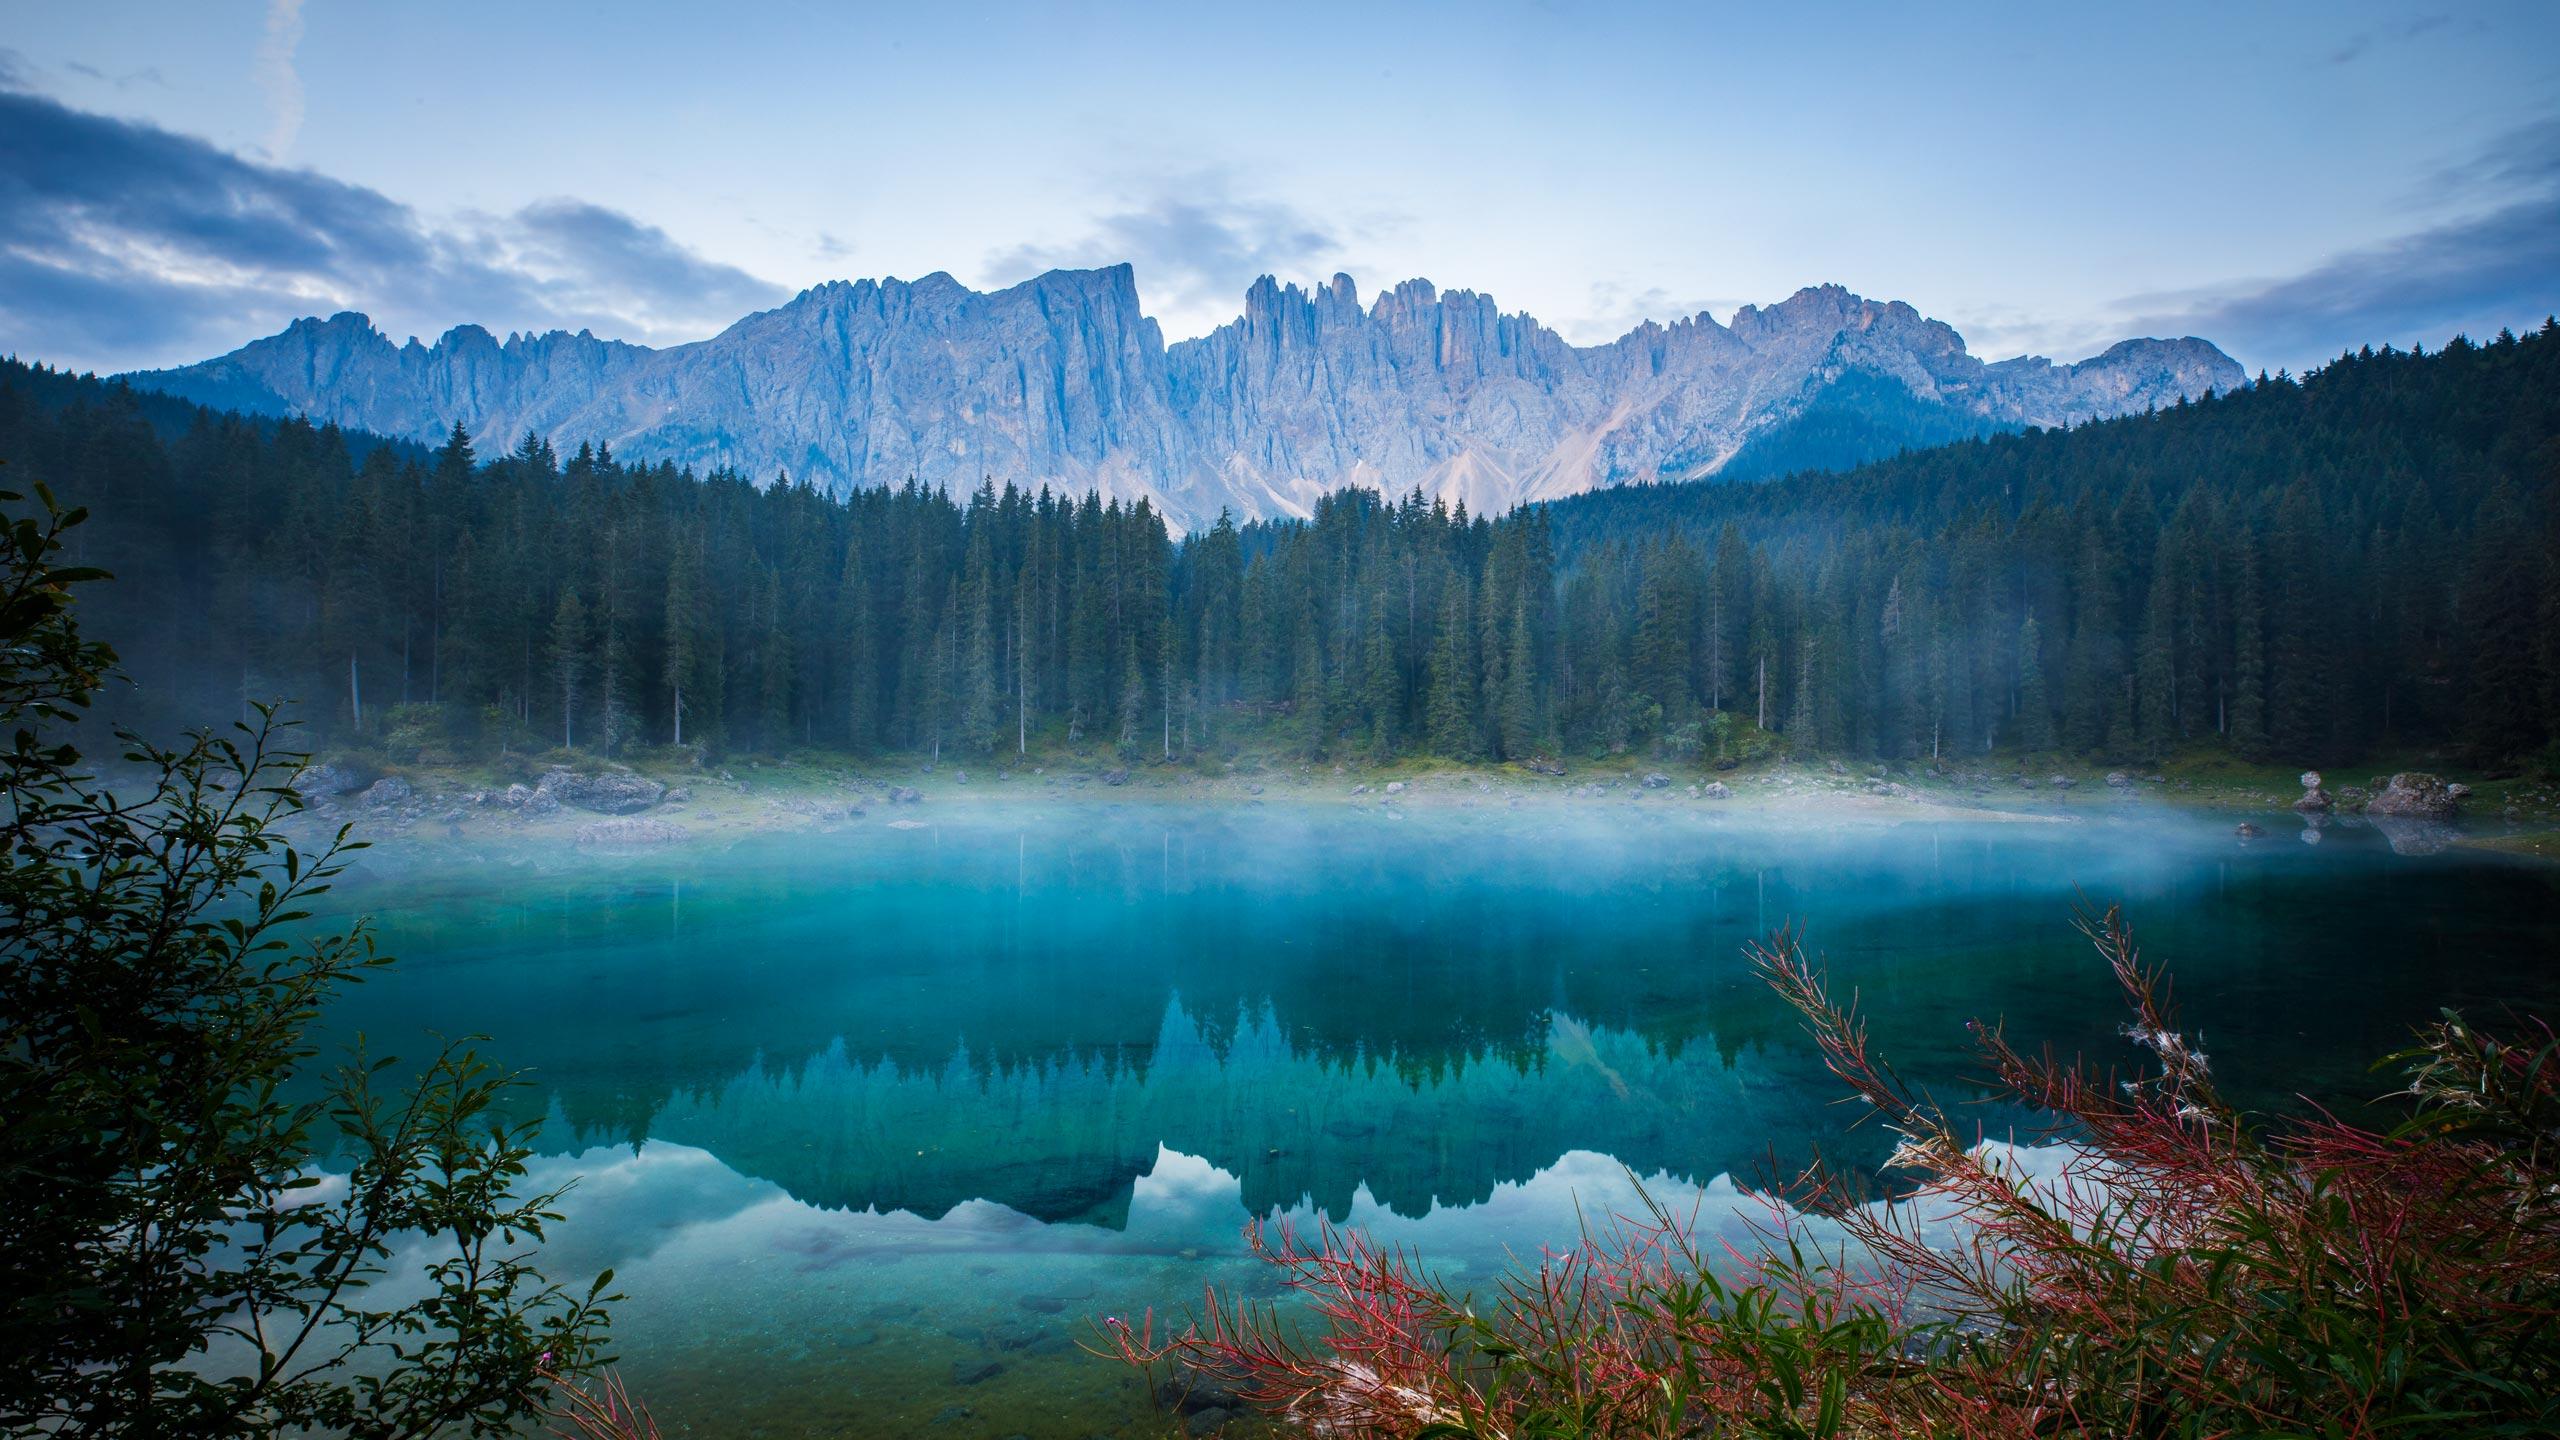 Tom_Schueler_Fotografie_Landschaft_Alpen_Dolomiten_6